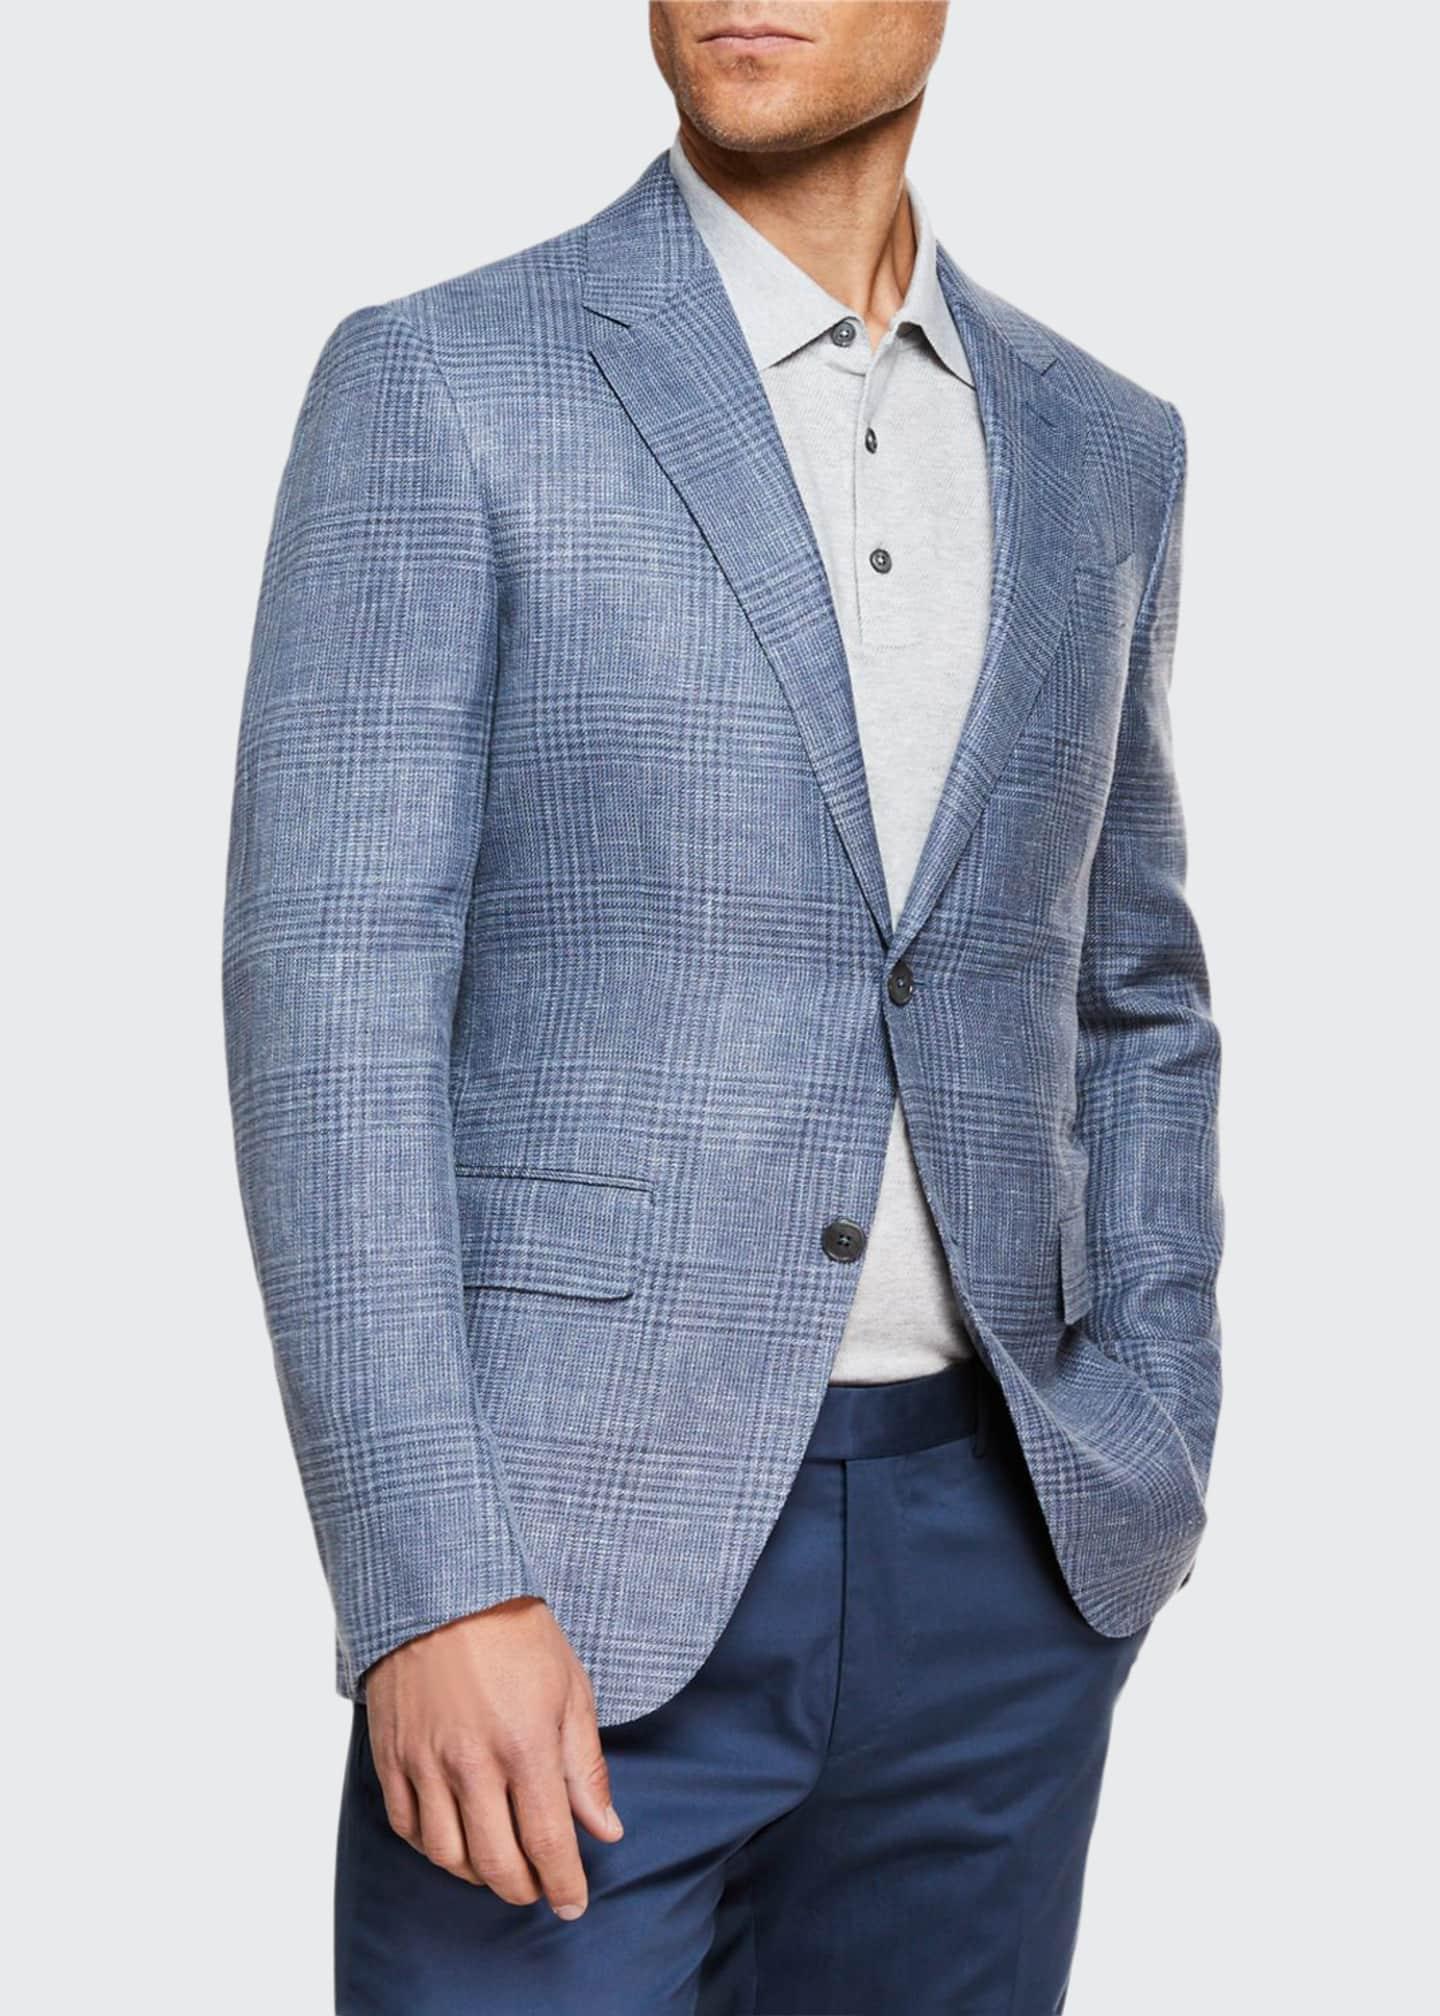 Ermenegildo Zegna Men's Plaid Crossover Two-Button Jacket